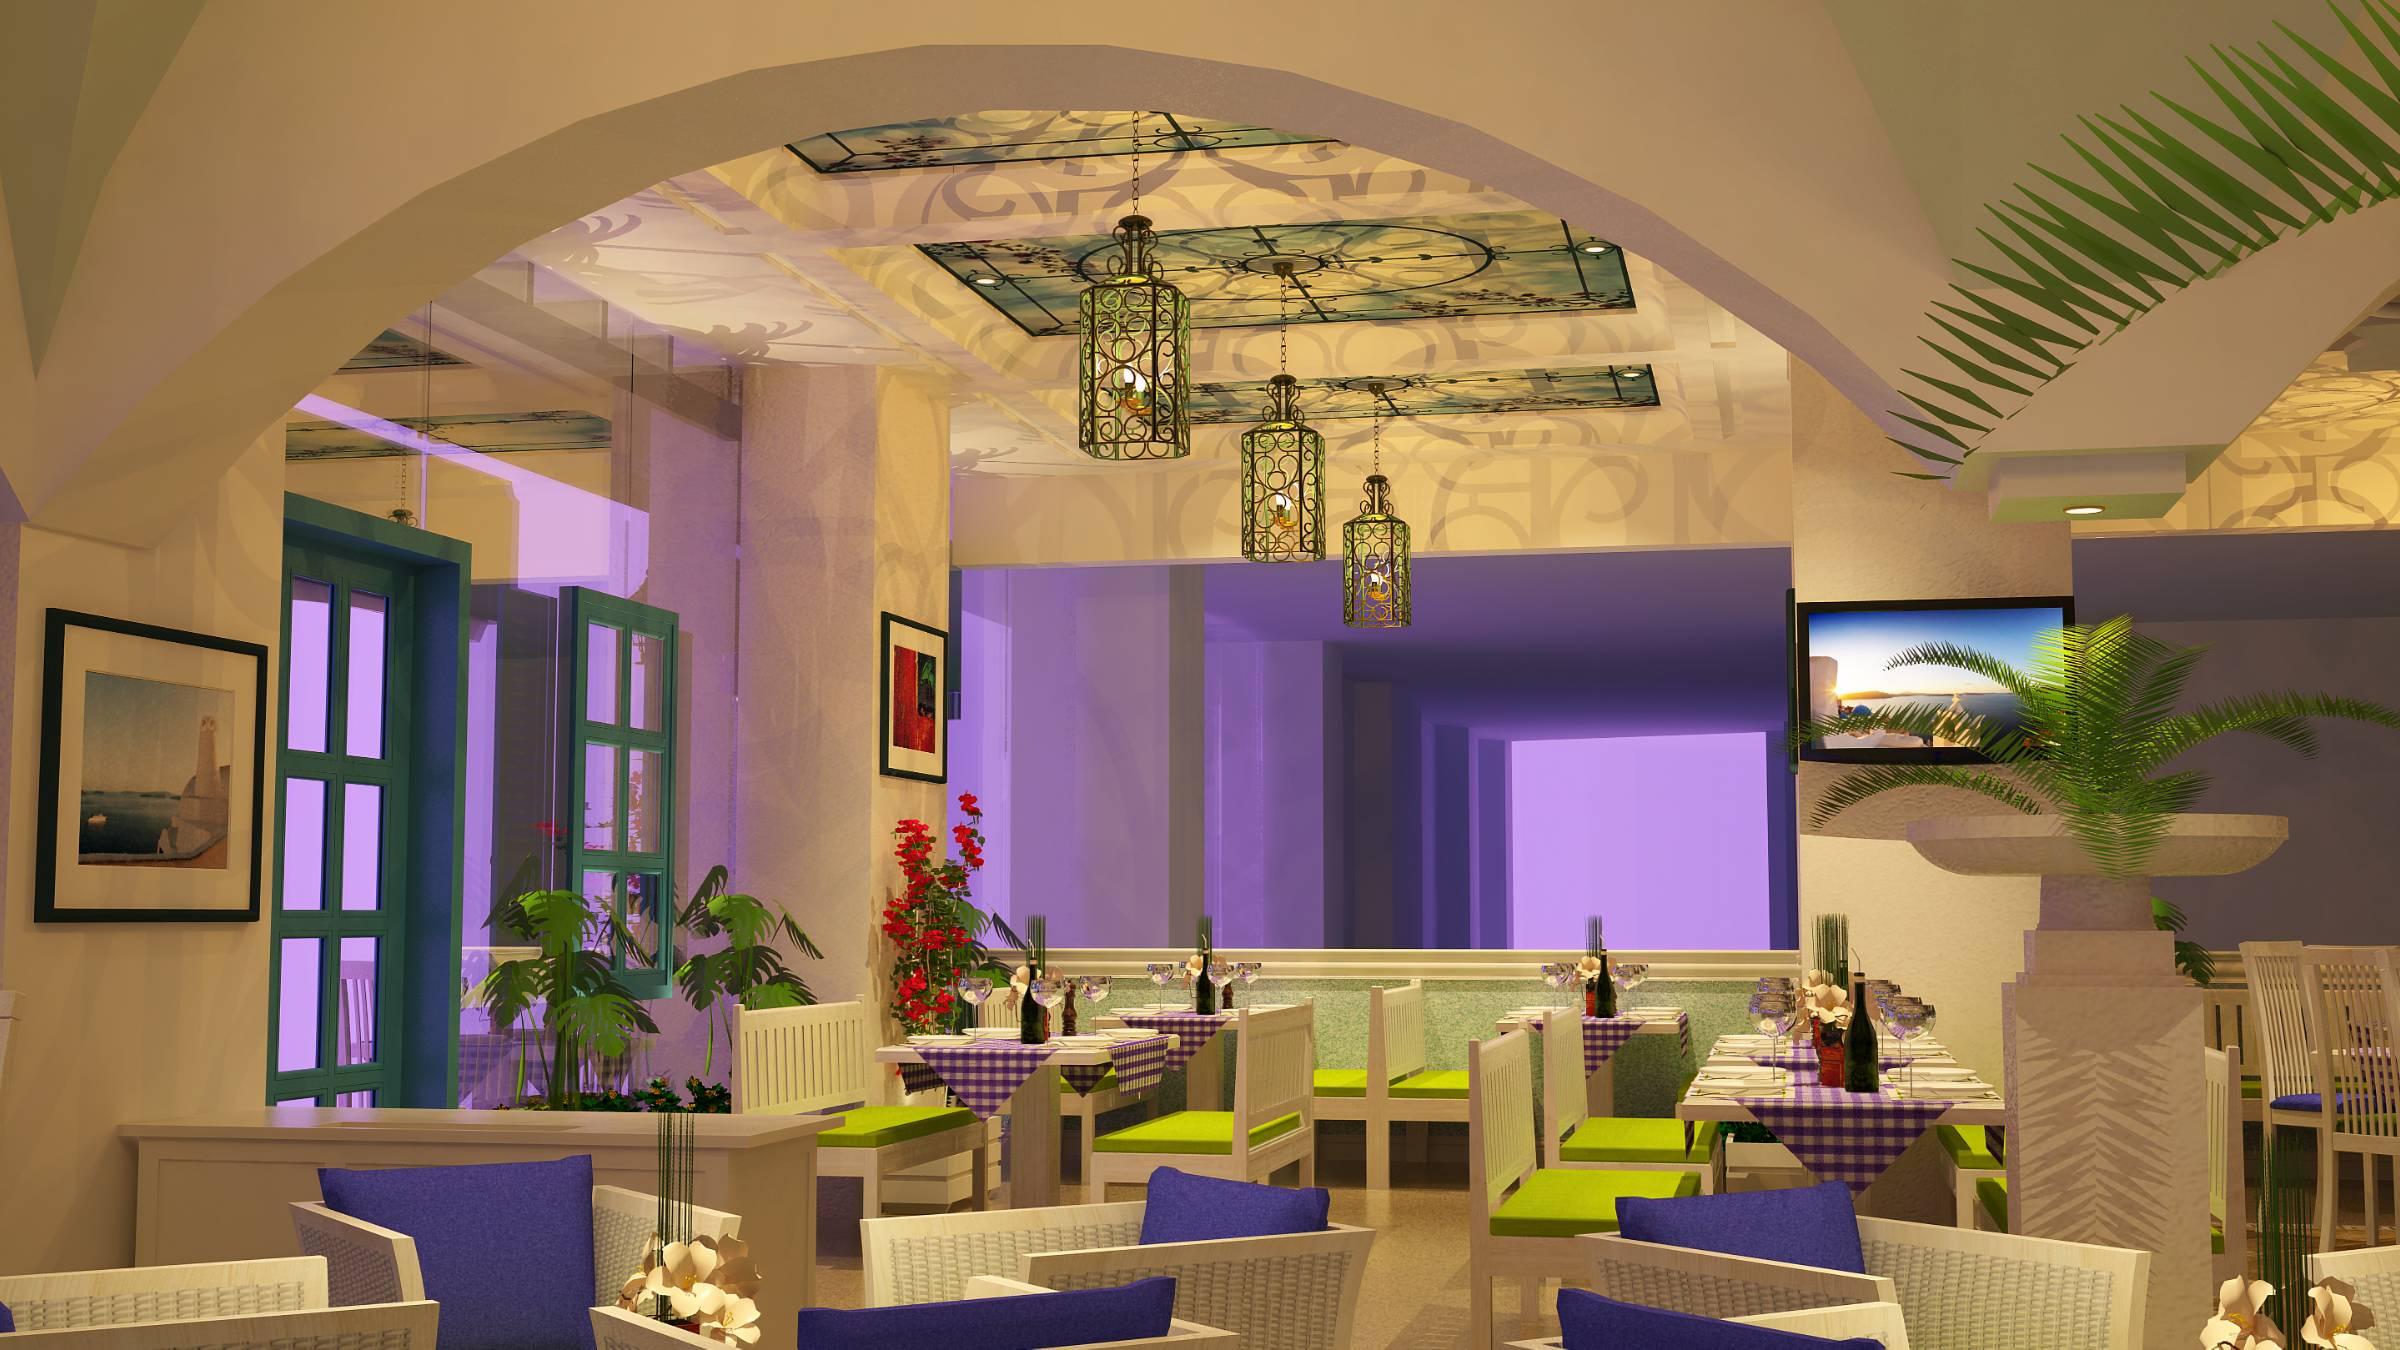 Fresco restaurant Mediterranean dining seating